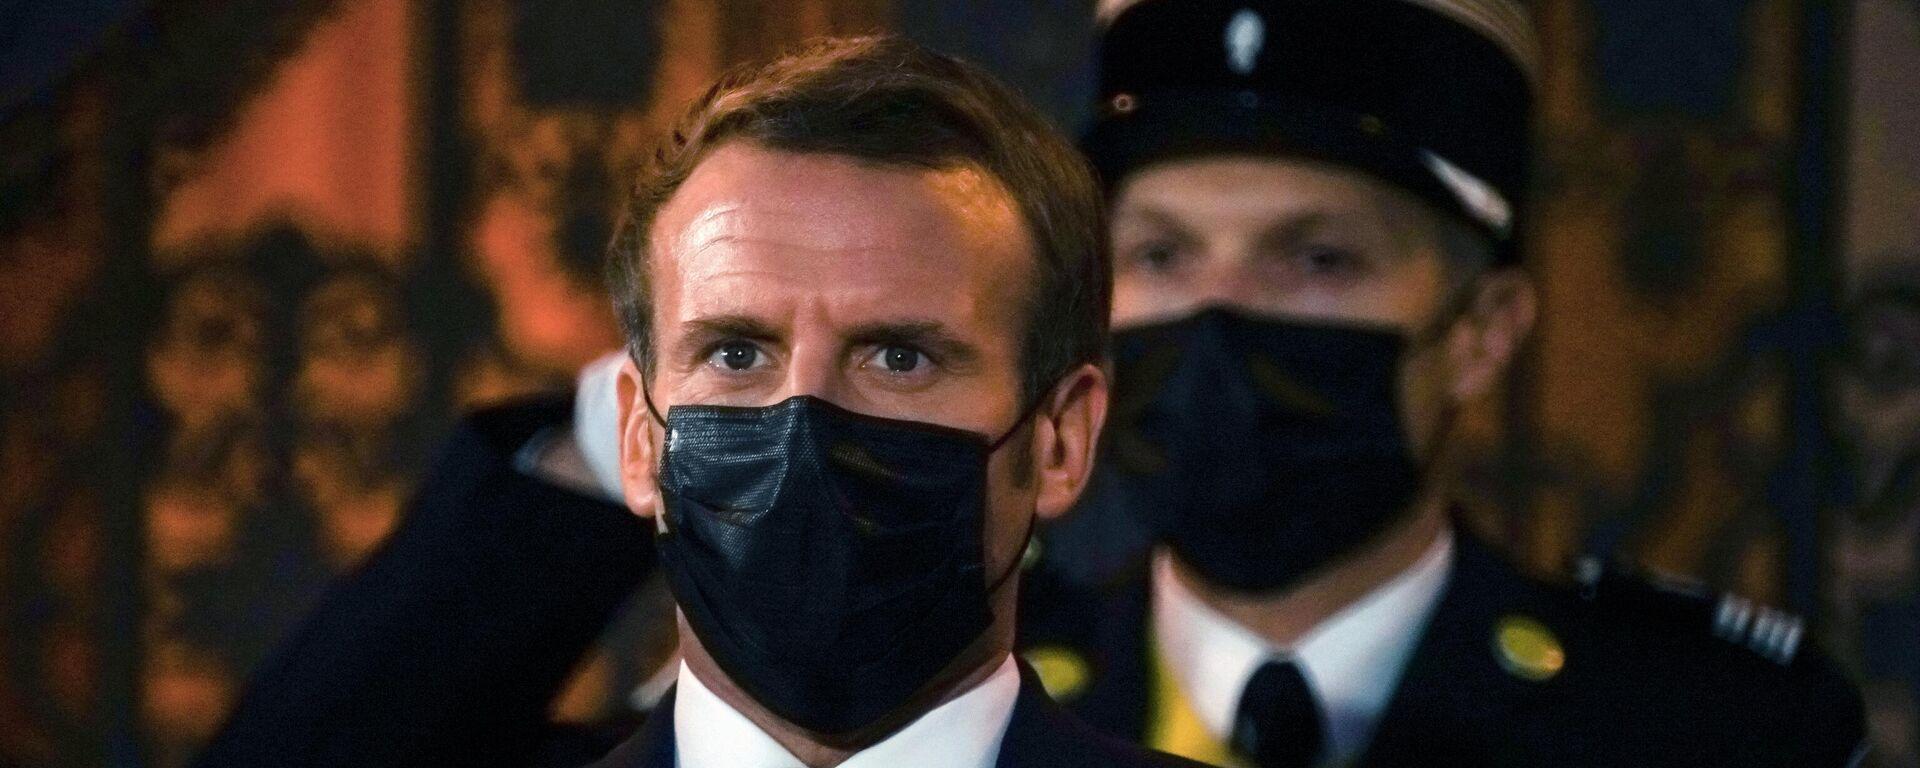 Frankreichs Staatspräsident Emmanuel Macron (Archiv) - SNA, 1920, 08.04.2021